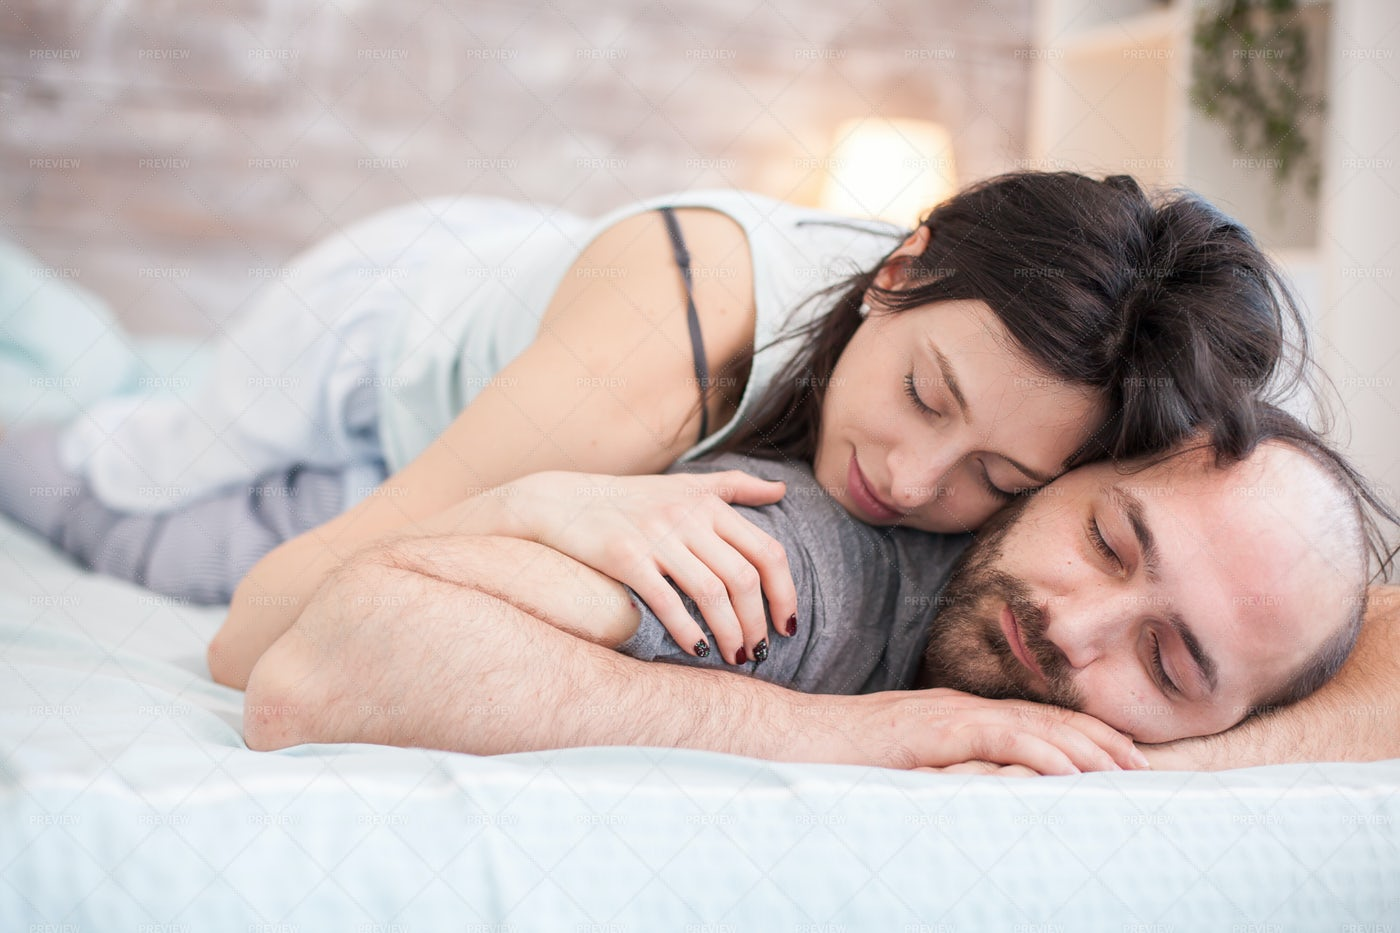 Woman Sleeping On Boyfriend - Stock Photos | Motion Array